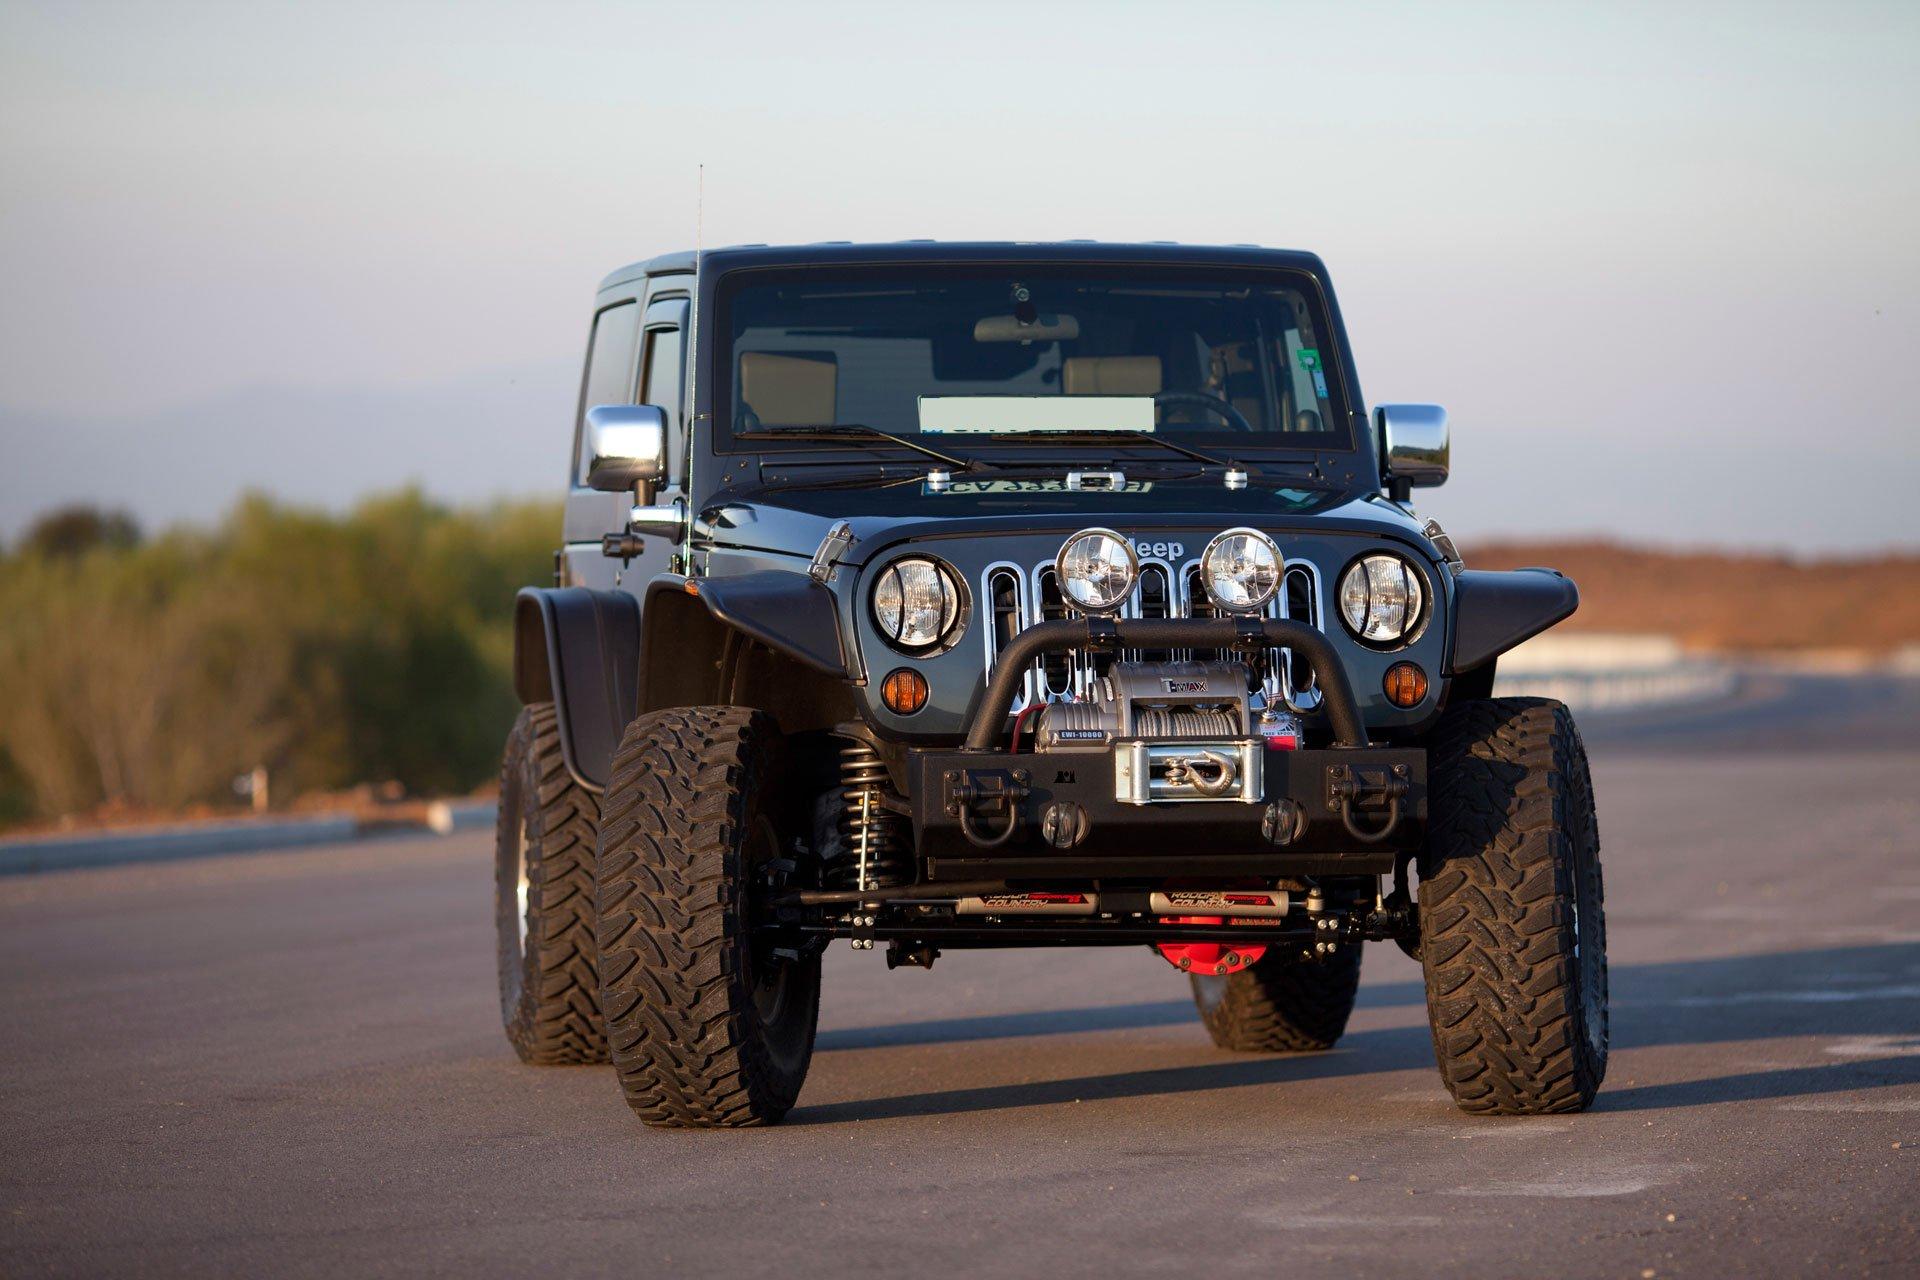 Brake Jobs Laredo Tx Car Alignments Tire Balancing More